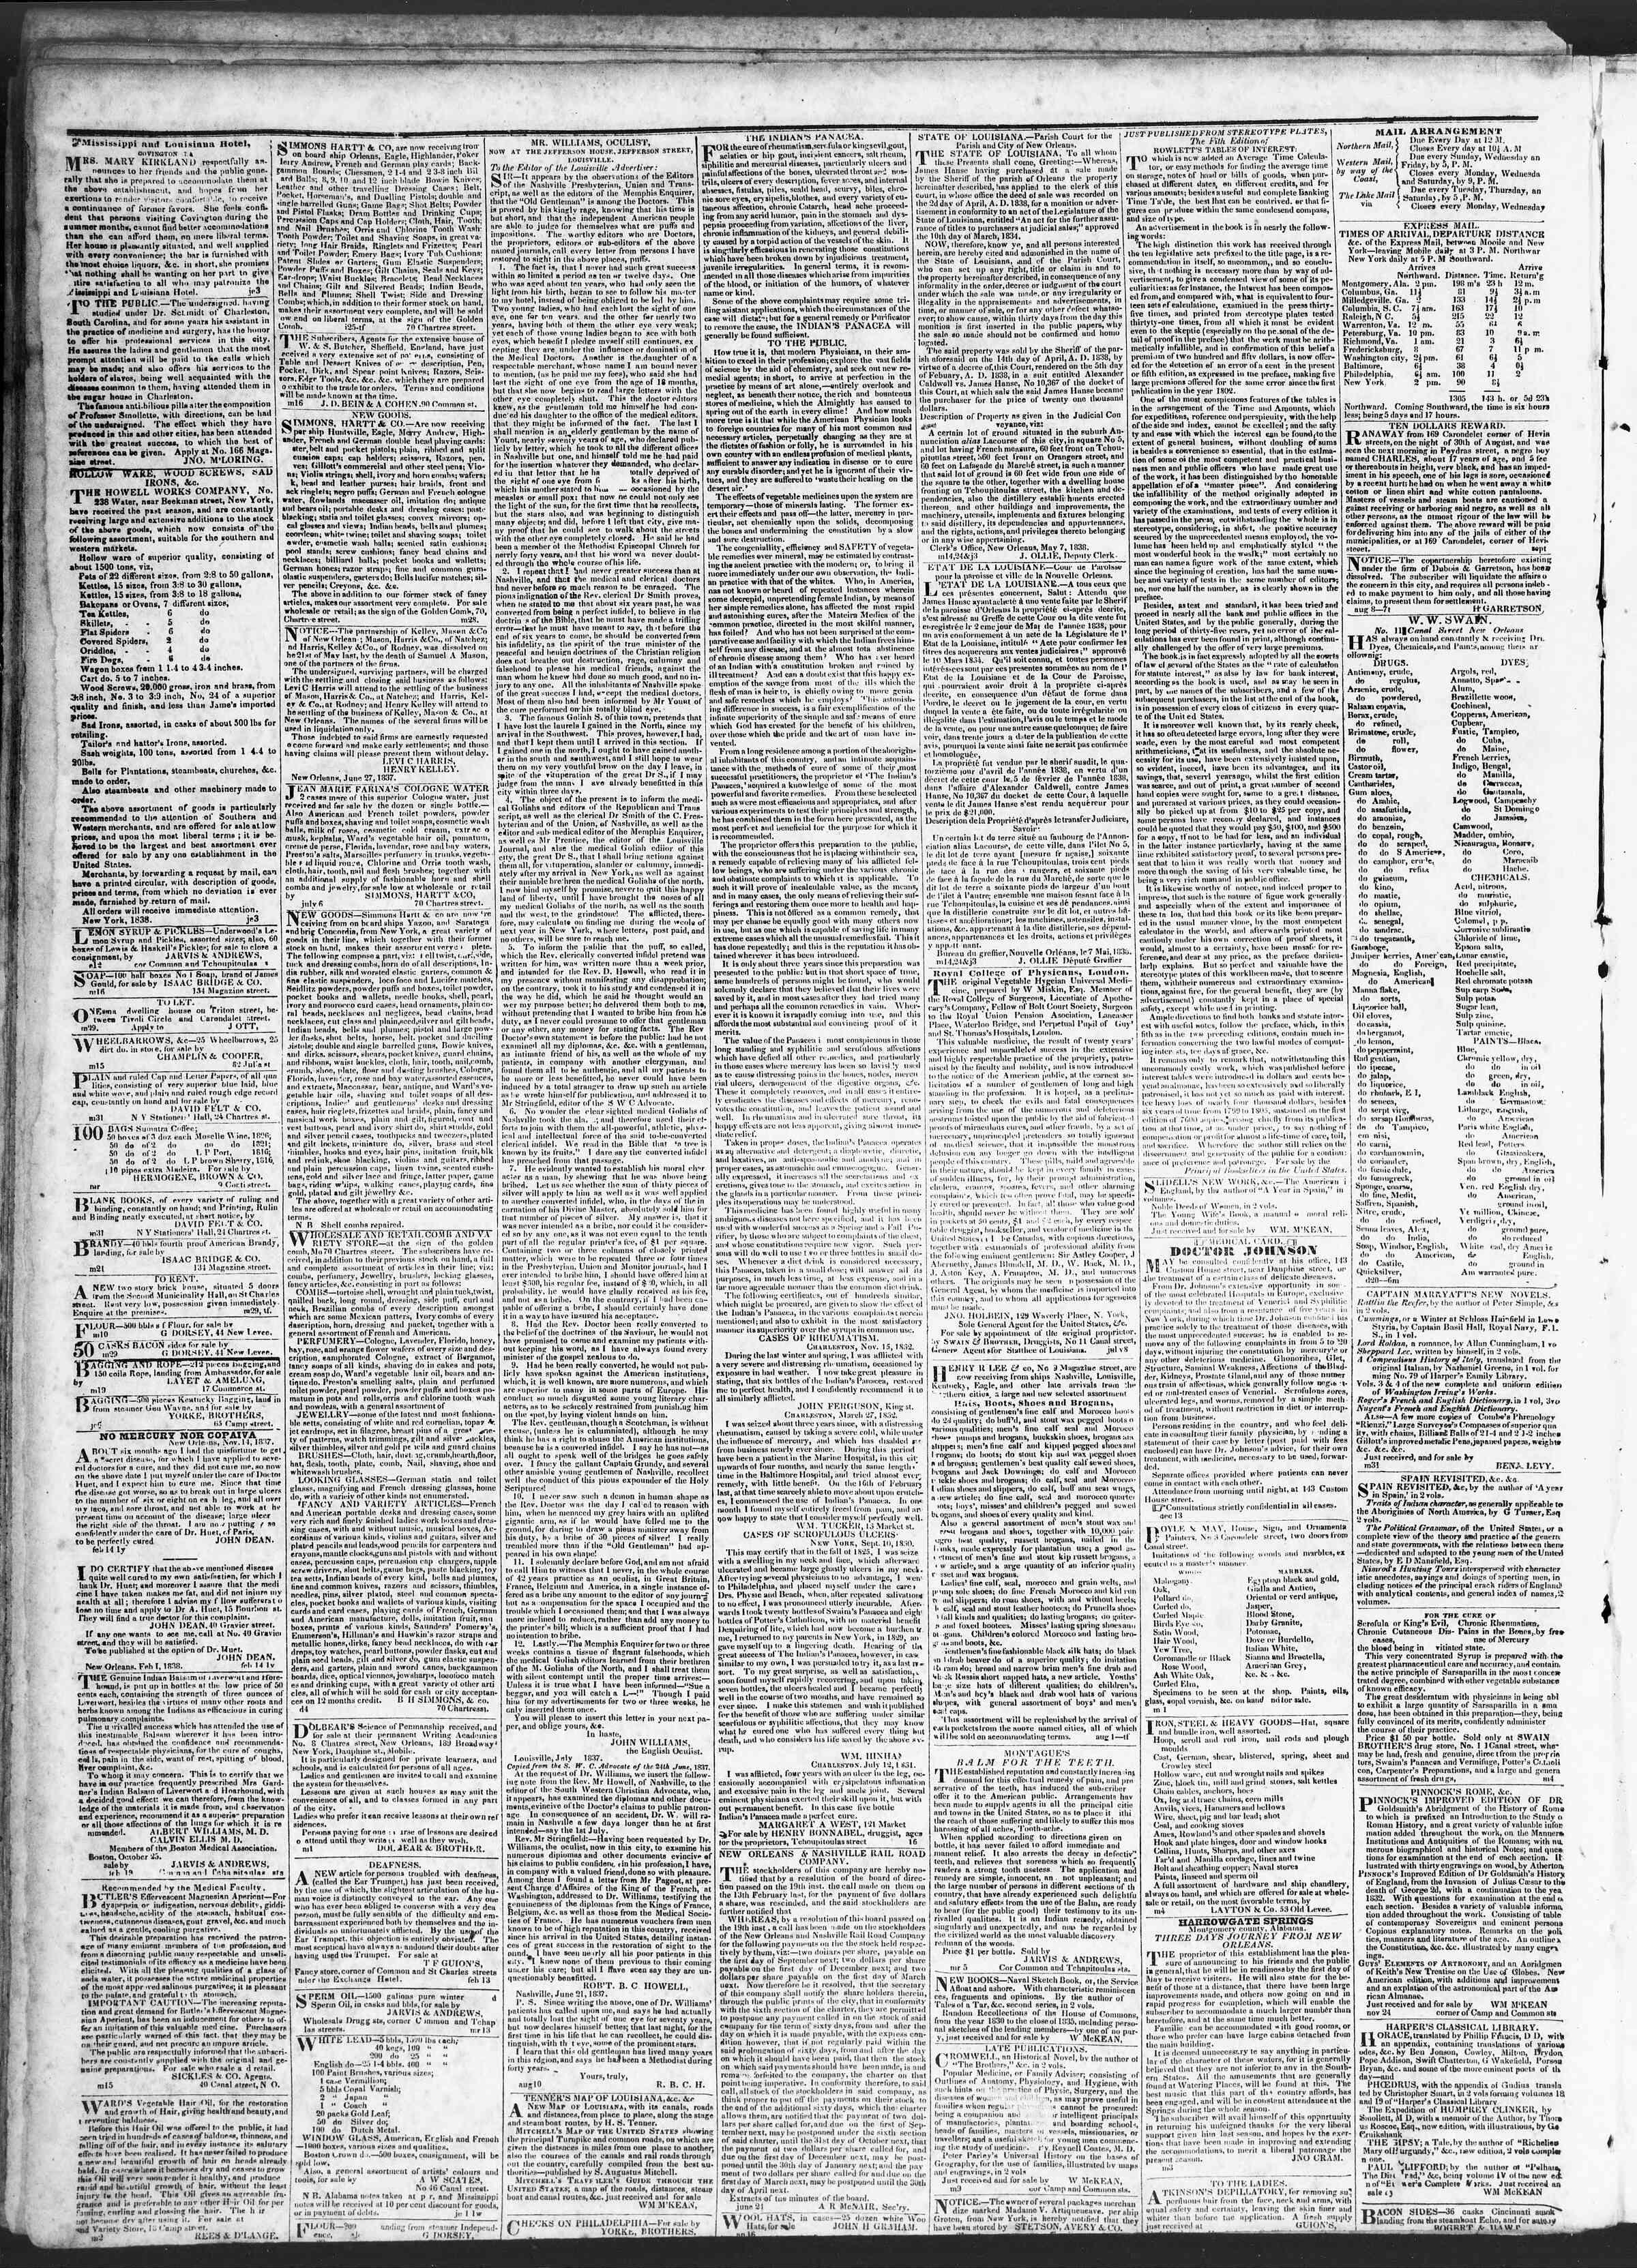 July 26, 1838 Tarihli True American Gazetesi Sayfa 4